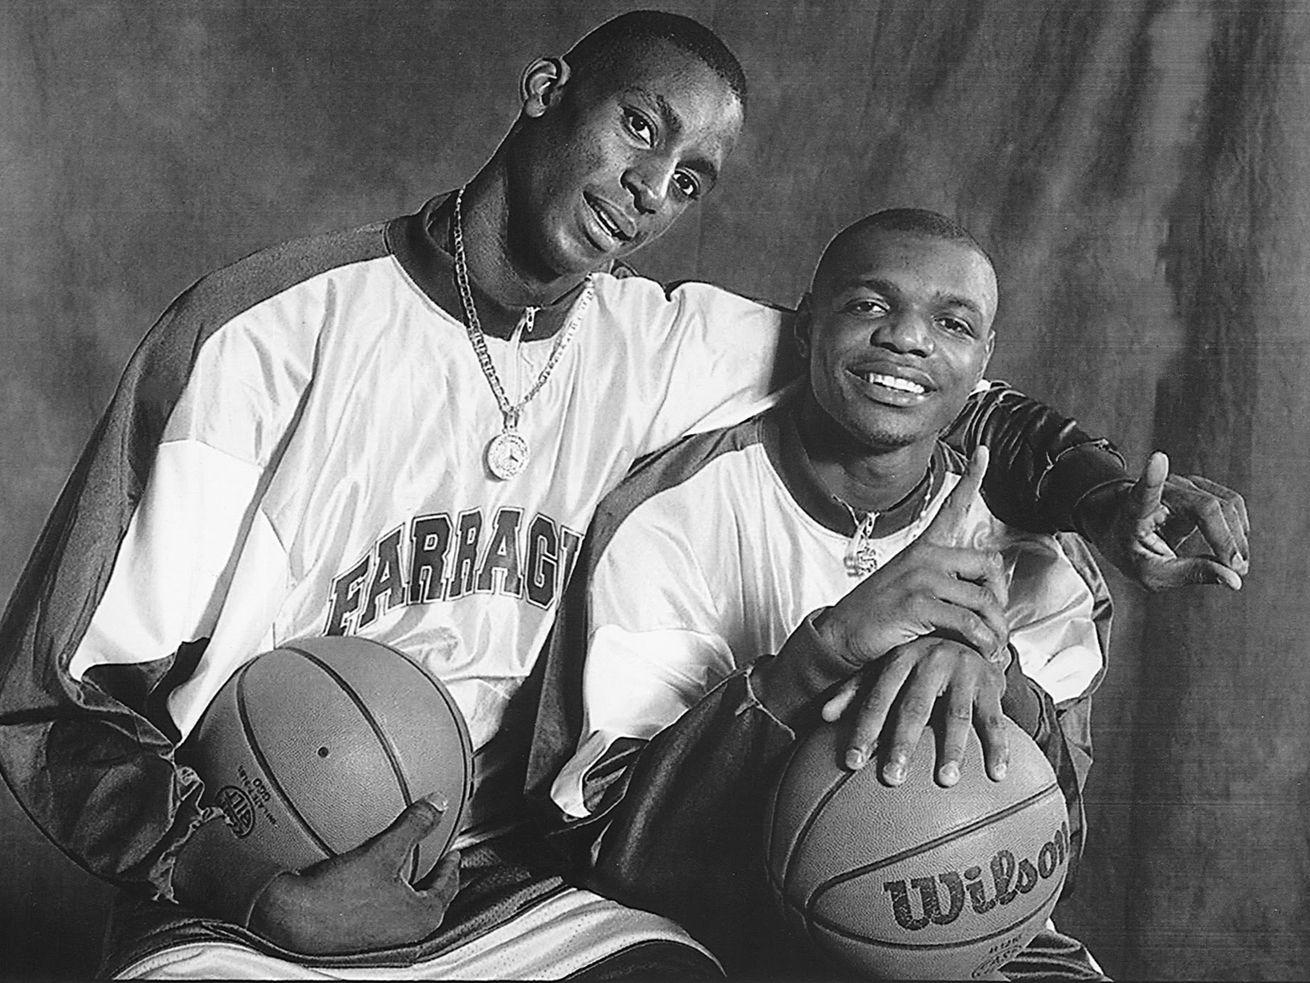 Farragut stars Kevin Garnett and Ronnie Fields shortly before the 1994-1995 basketball season.